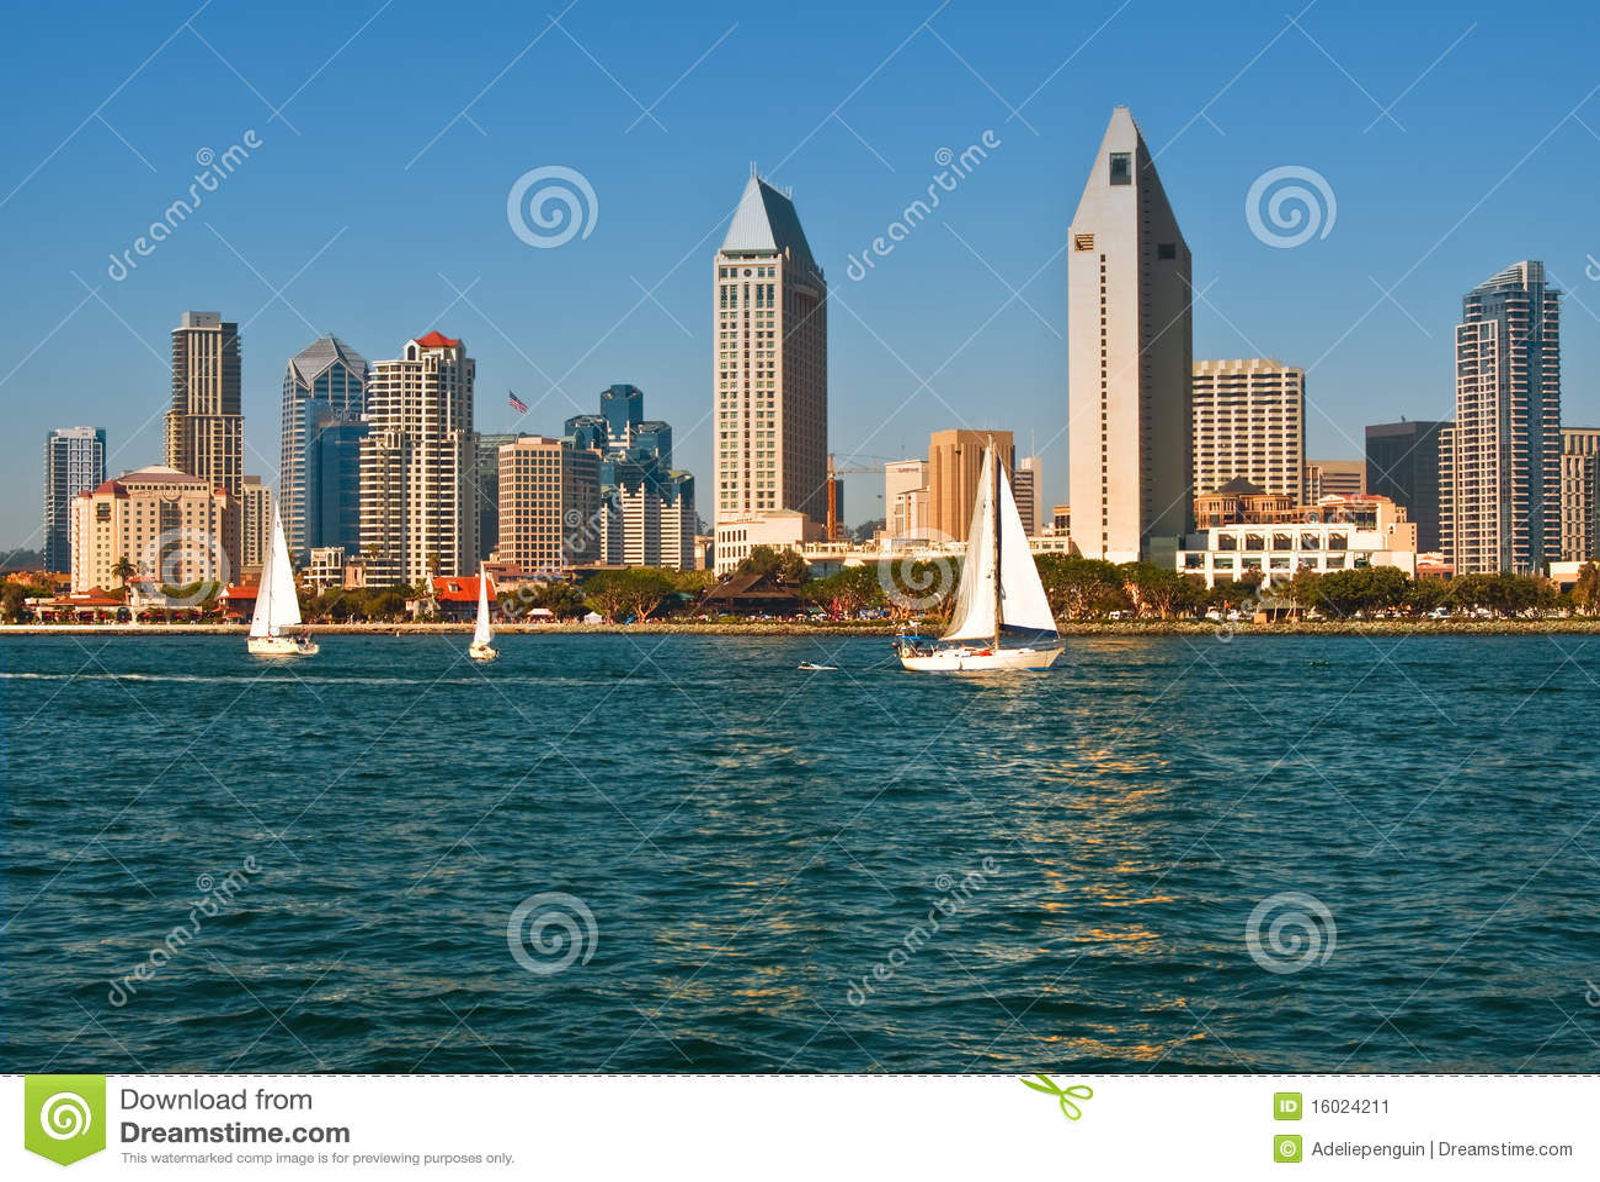 San Diego Skyline with Sailboats, California